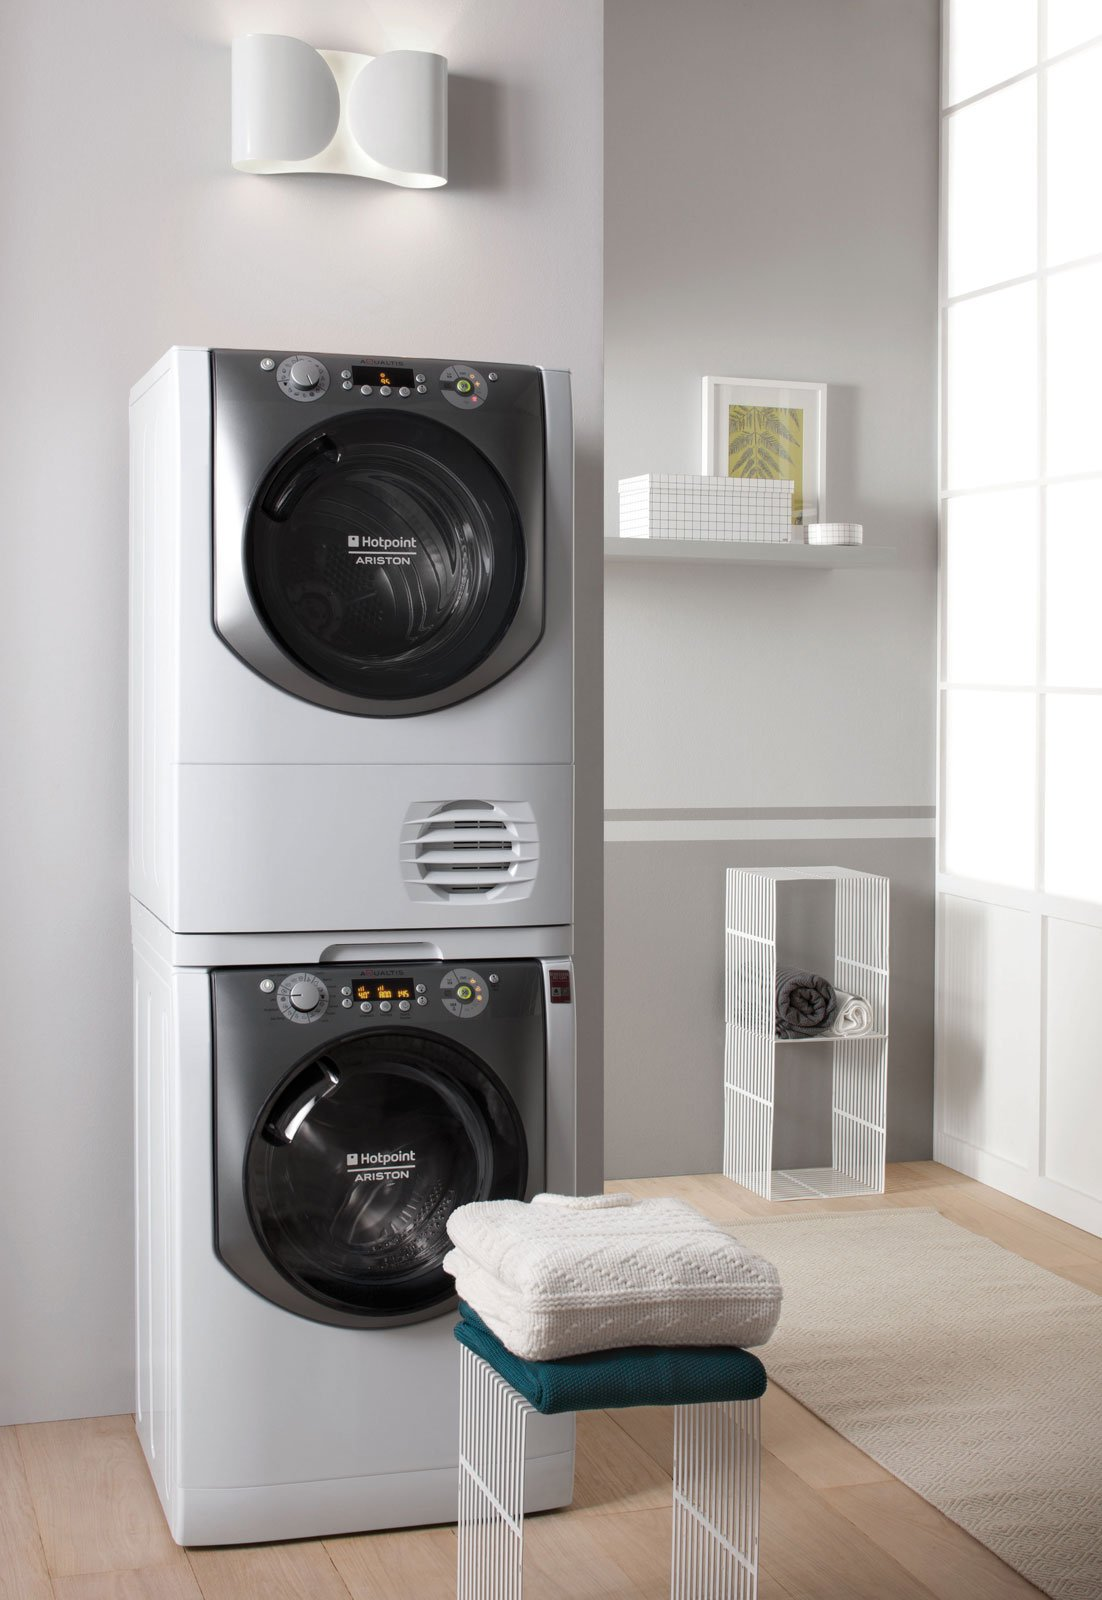 Colonna lavatrice asciugatrice ikea wa81 regardsdefemmes - Mobile lavatrice asciugatrice ...